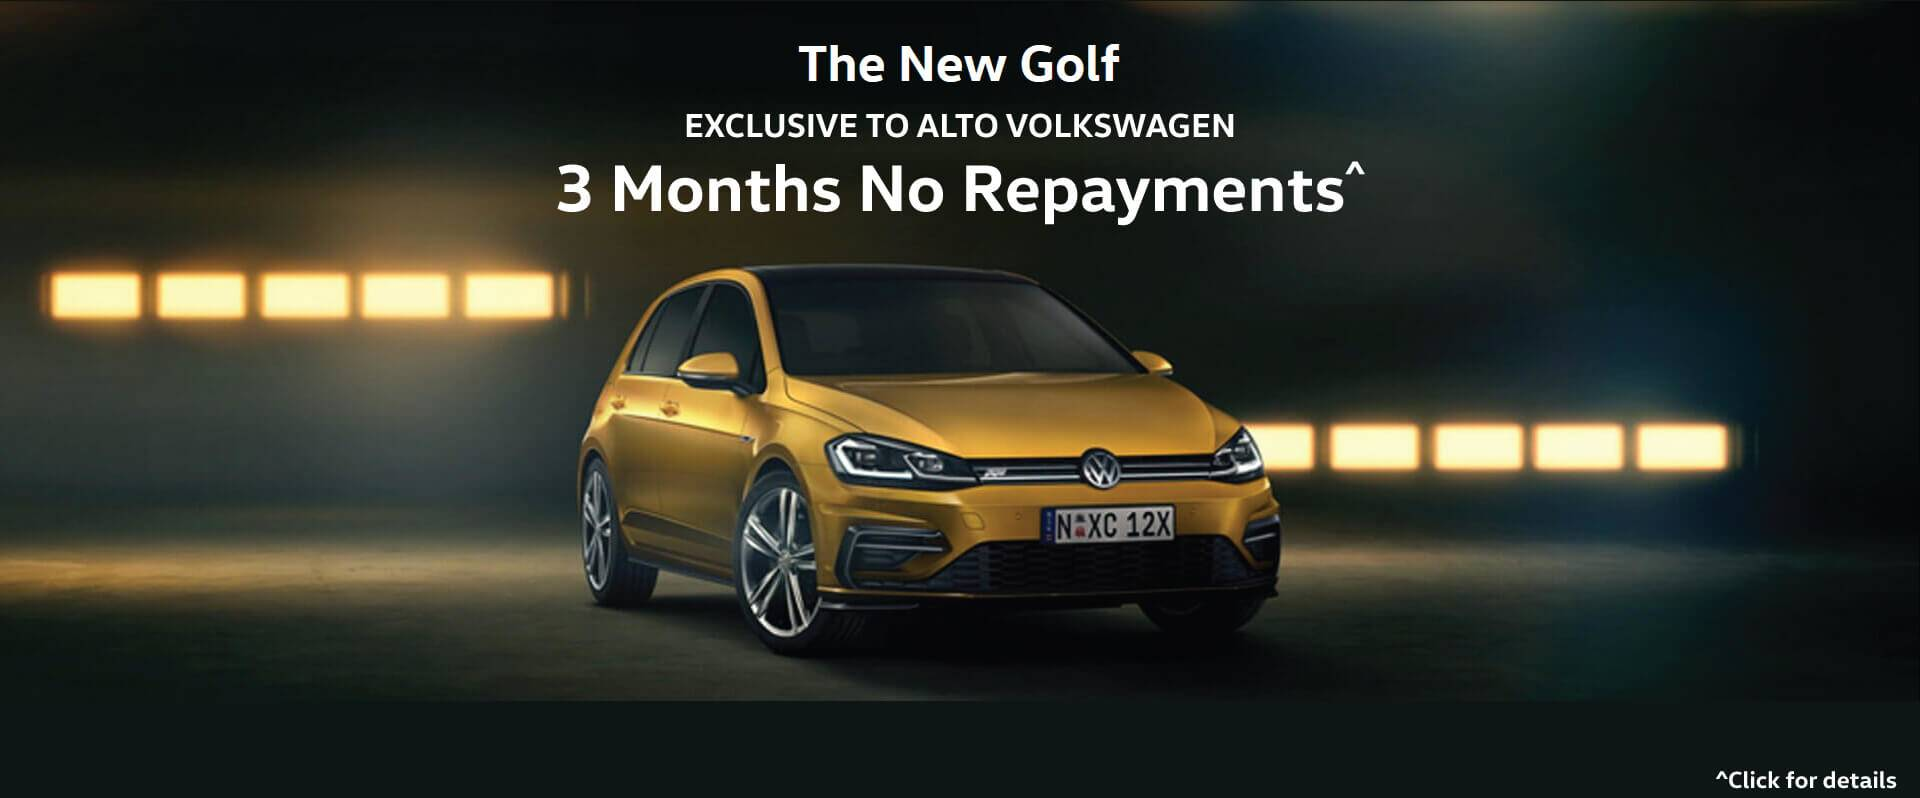 Alto Volkswagen - New Golf